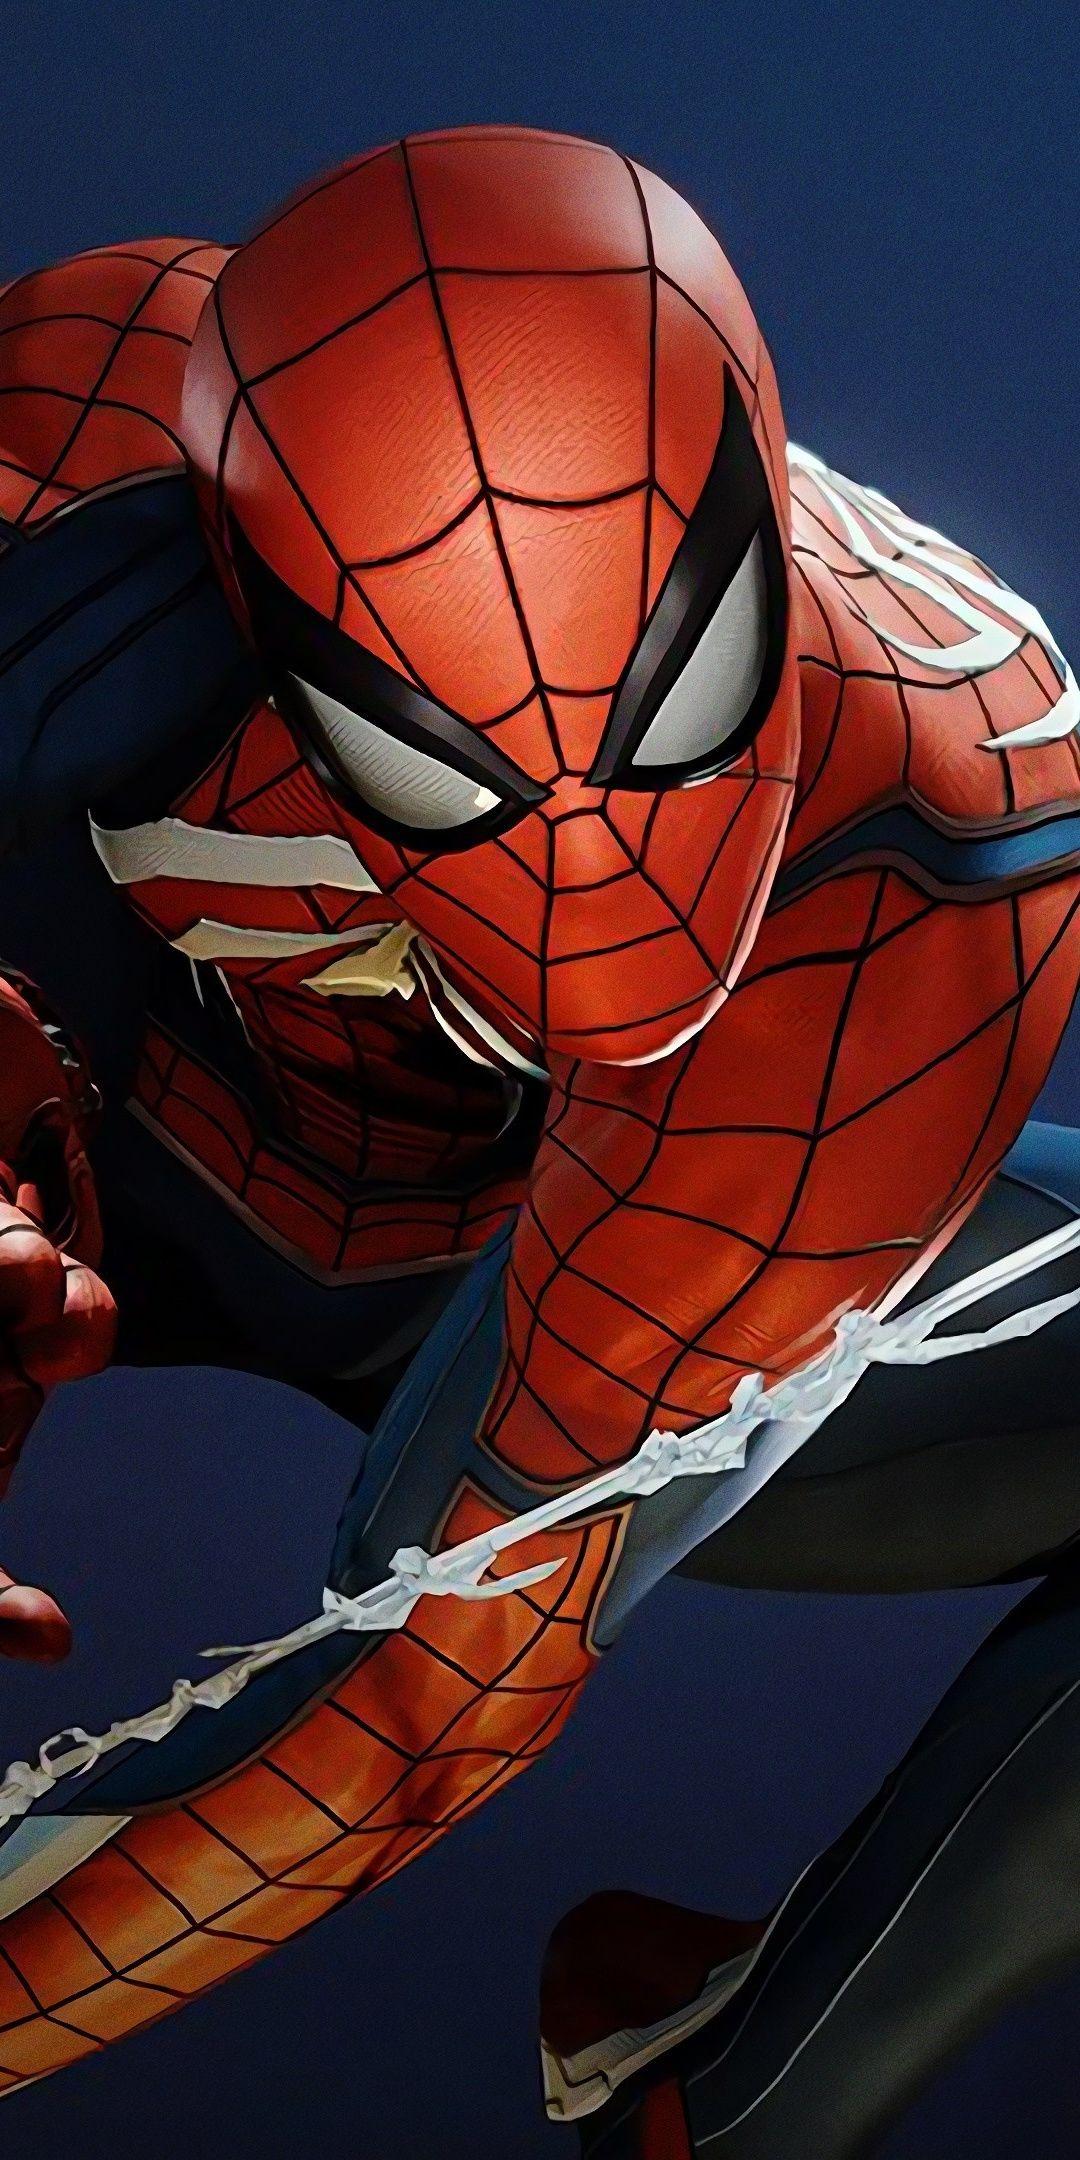 Artwork, superhero, Spiderman (PS4), fan art, 1080x2160